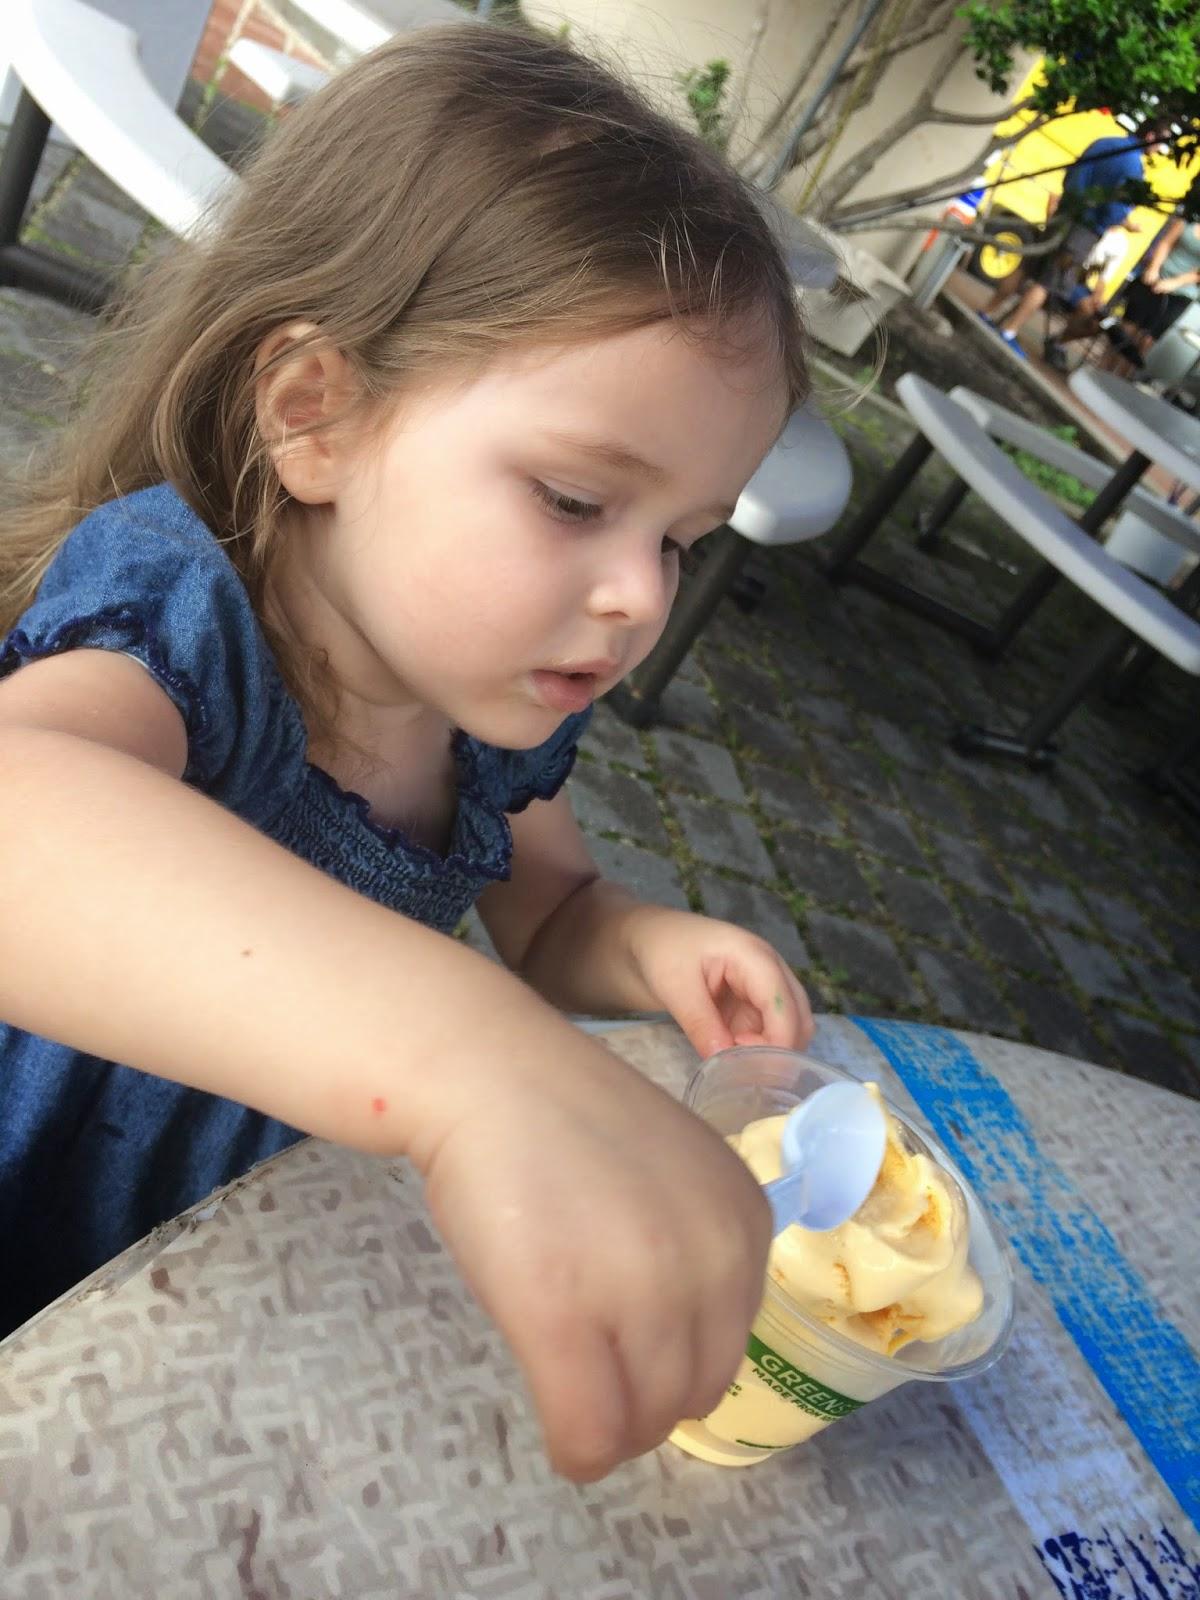 enjoying locally made ice cream at RAM #jaxblogger #flblogger